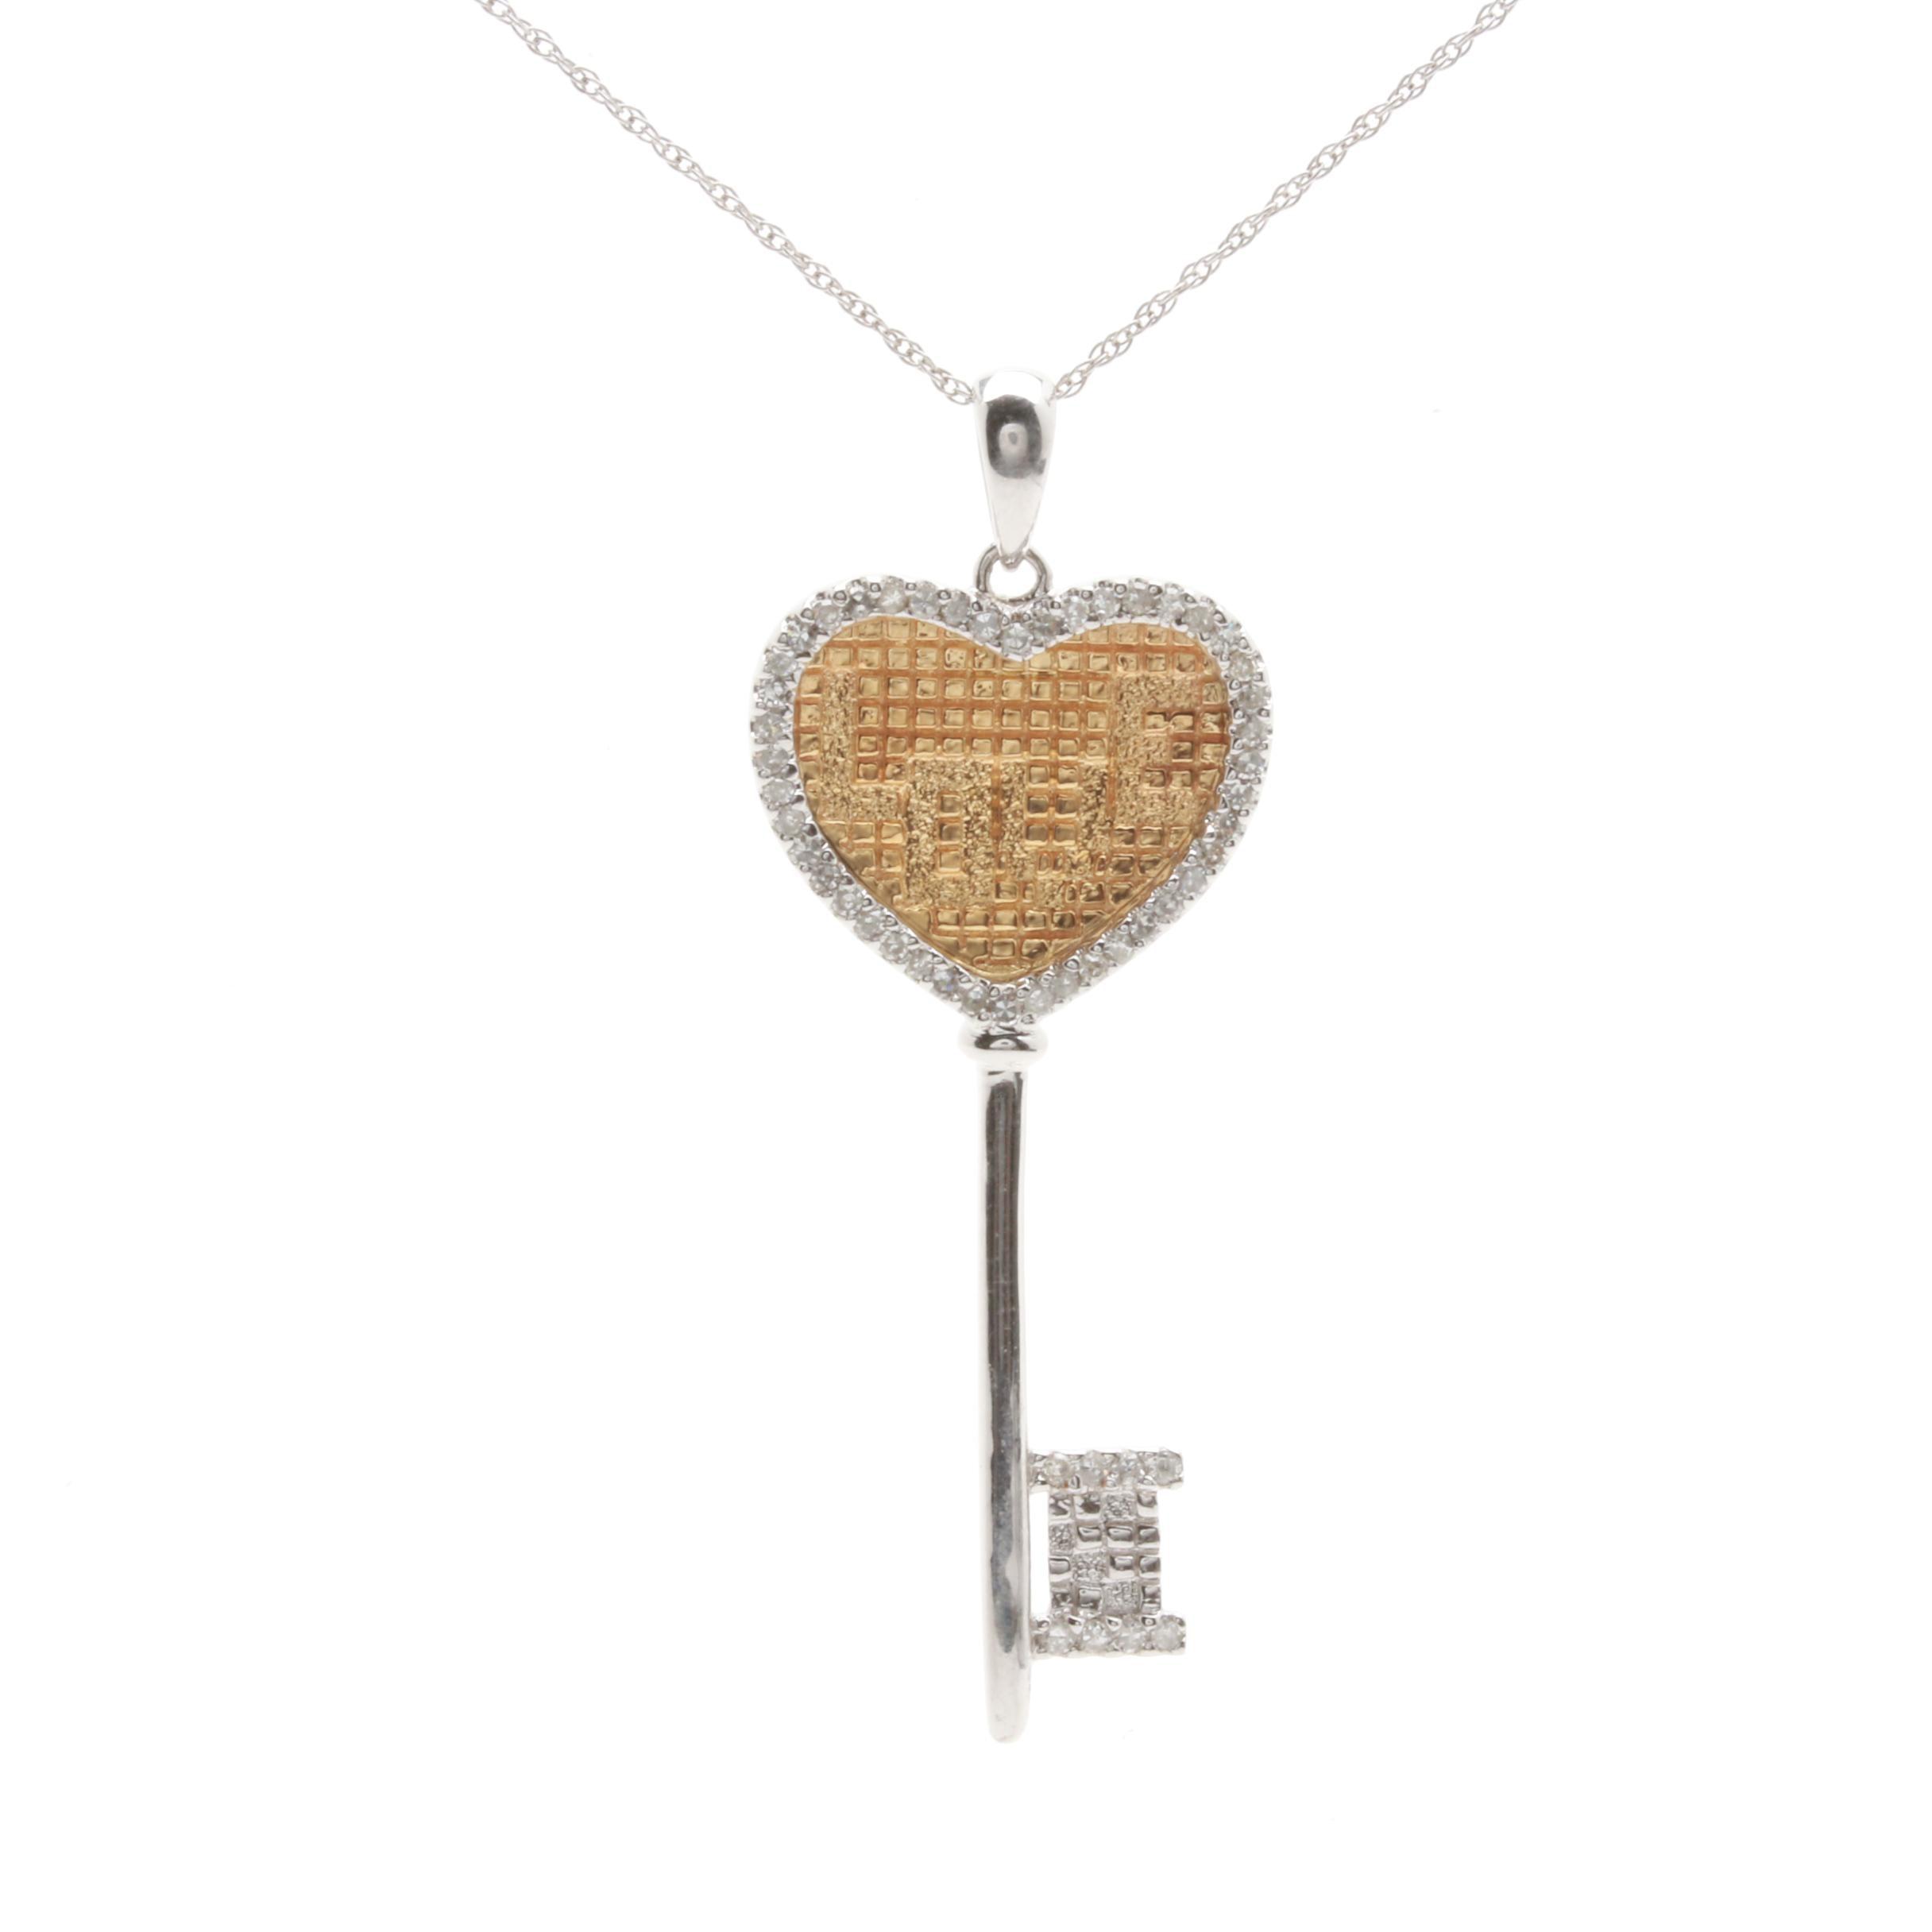 14K White and Yellow Gold Diamond Heart Key Pendant Necklace